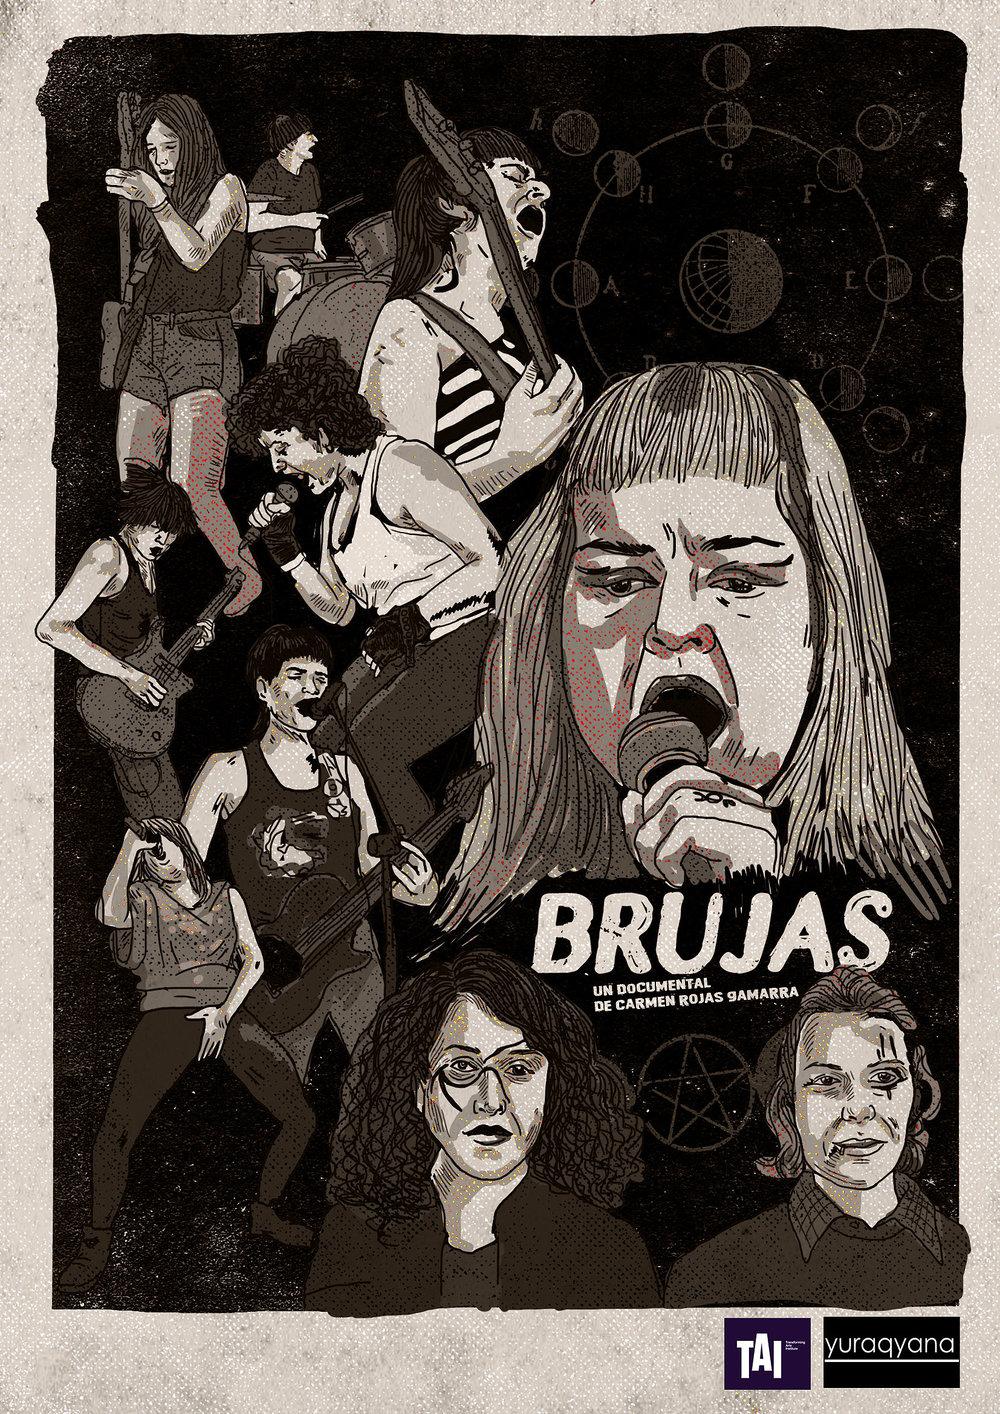 brujas boceto byn.jpg